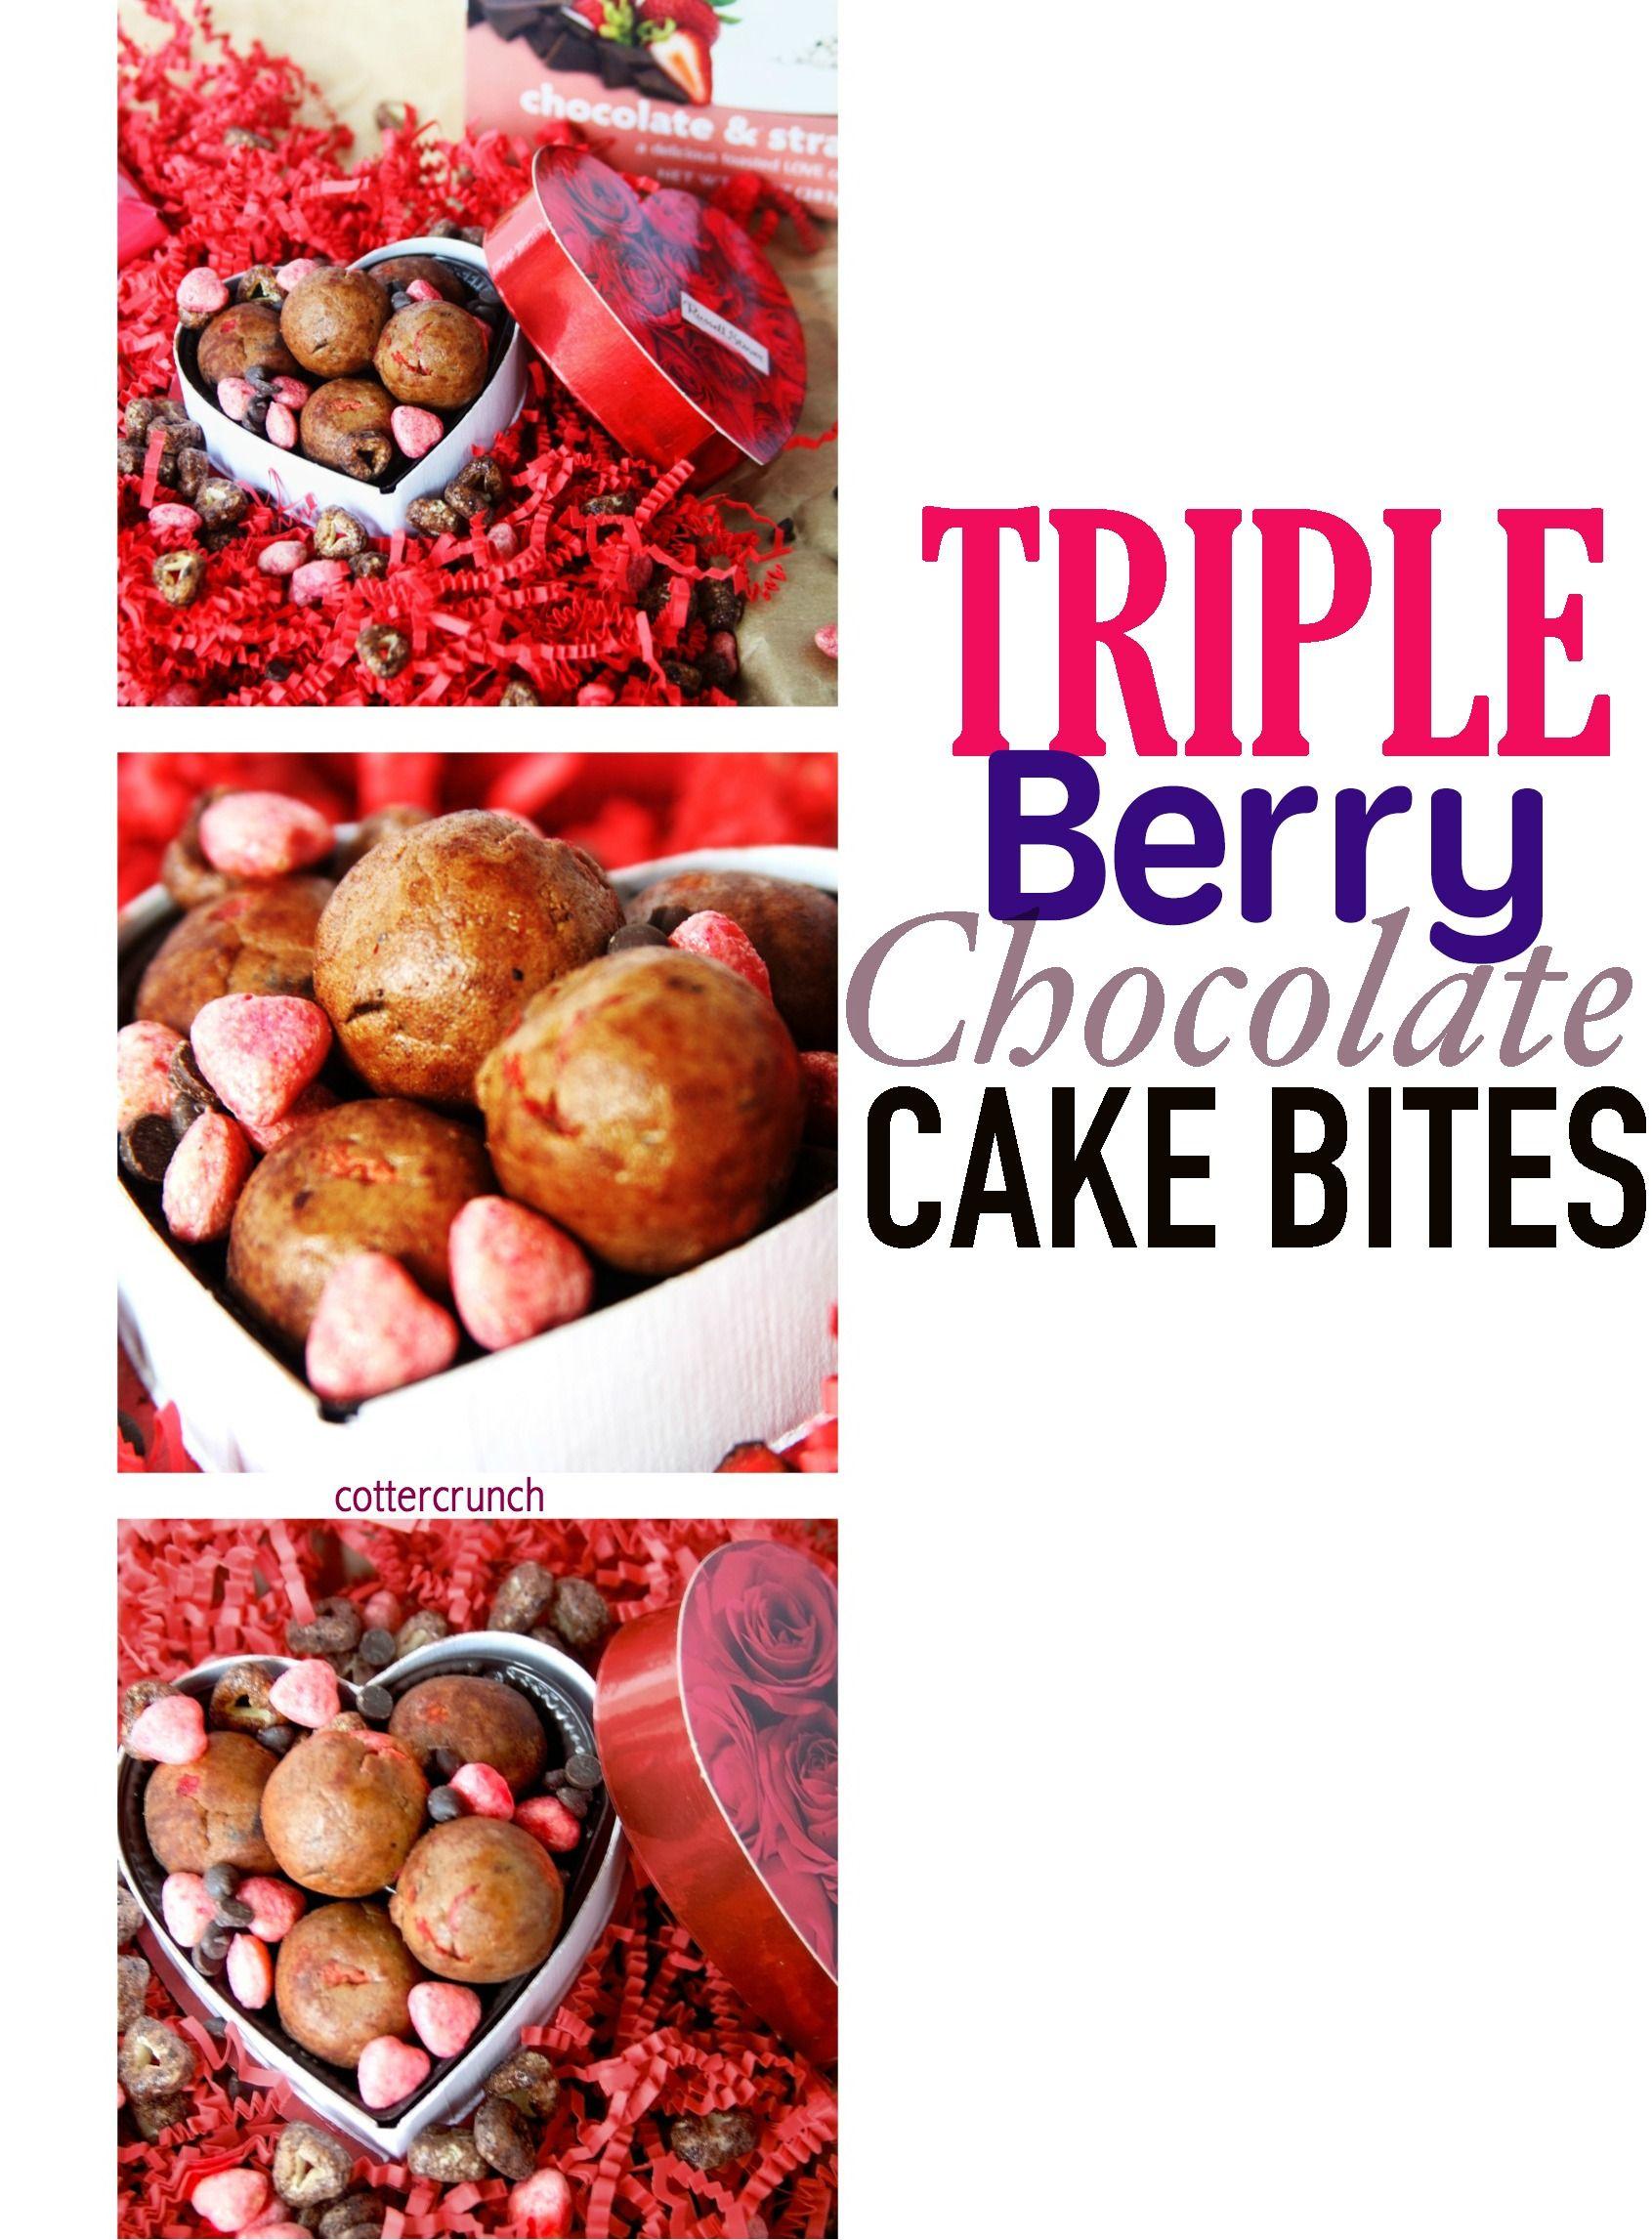 Gluten free triple berry chocolate cake bites recipe